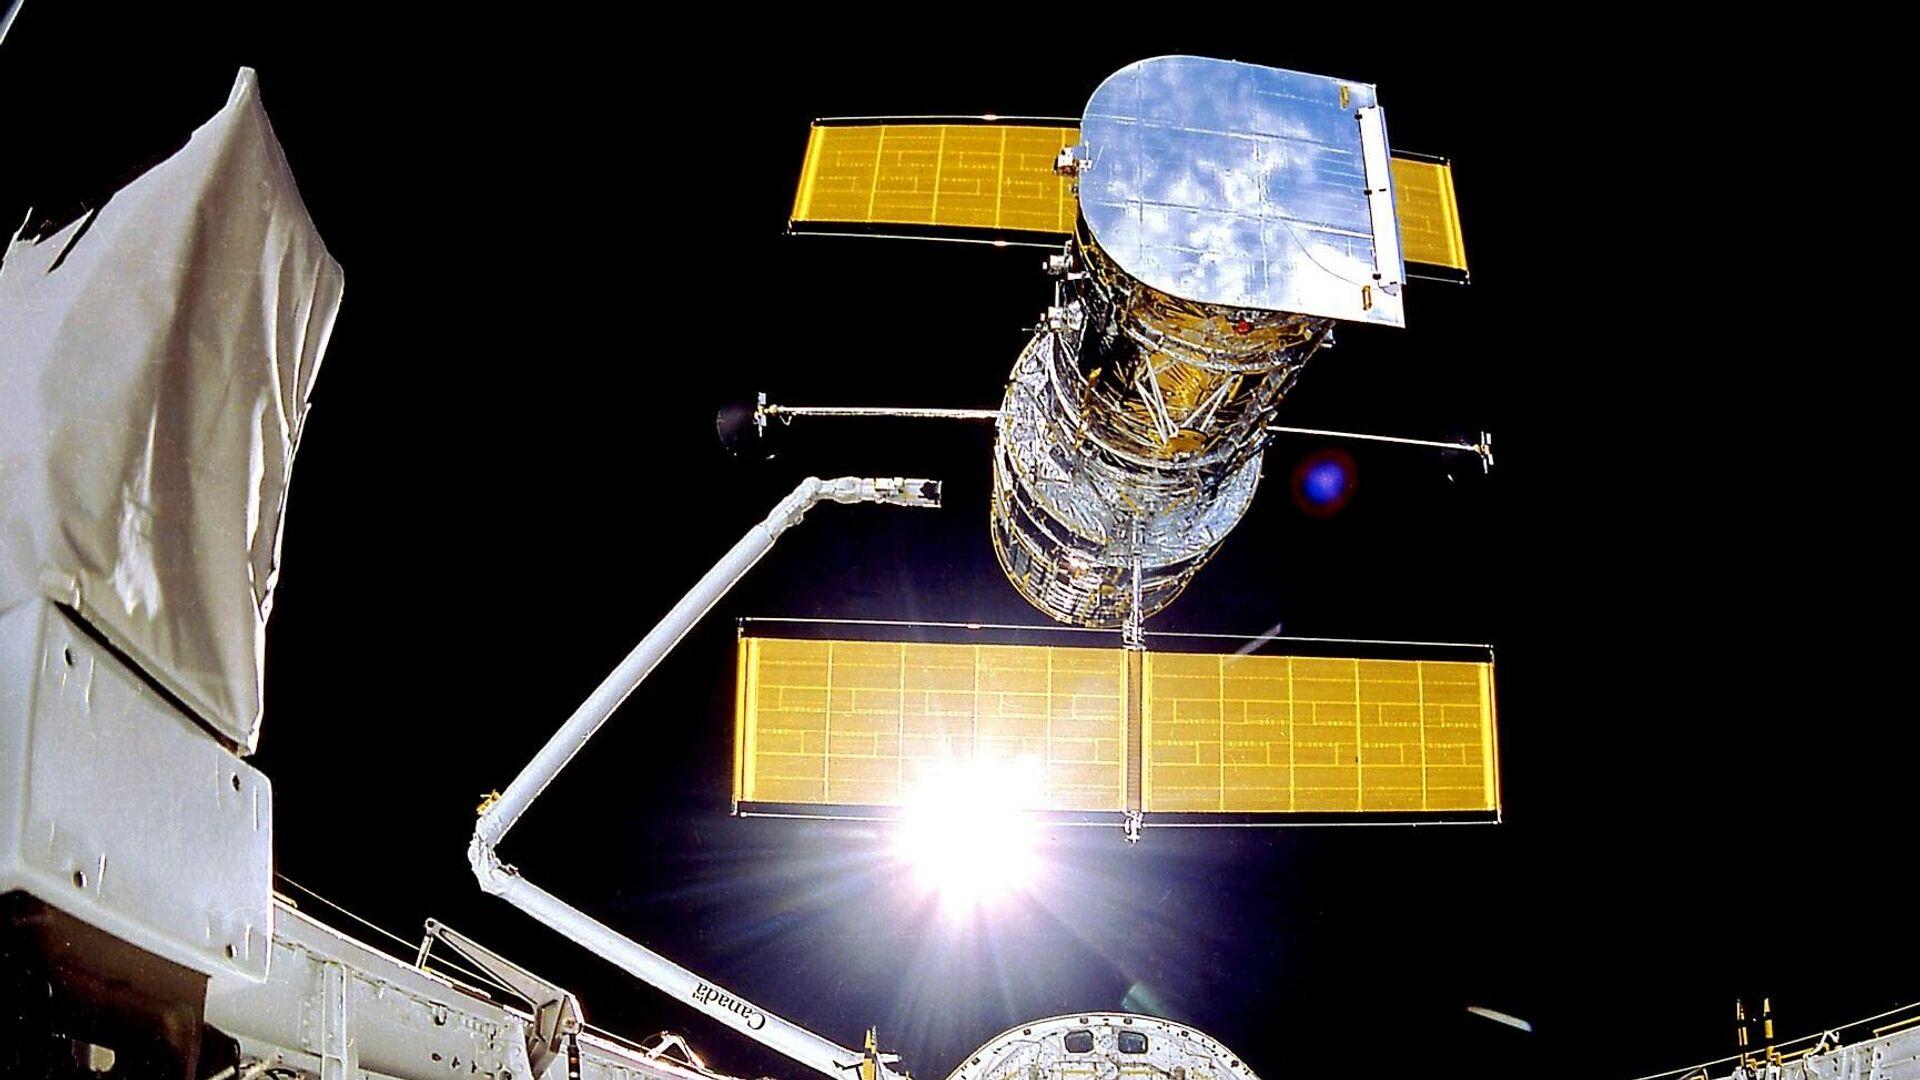 El telescopio espacial Hubble - Sputnik Mundo, 1920, 22.06.2021